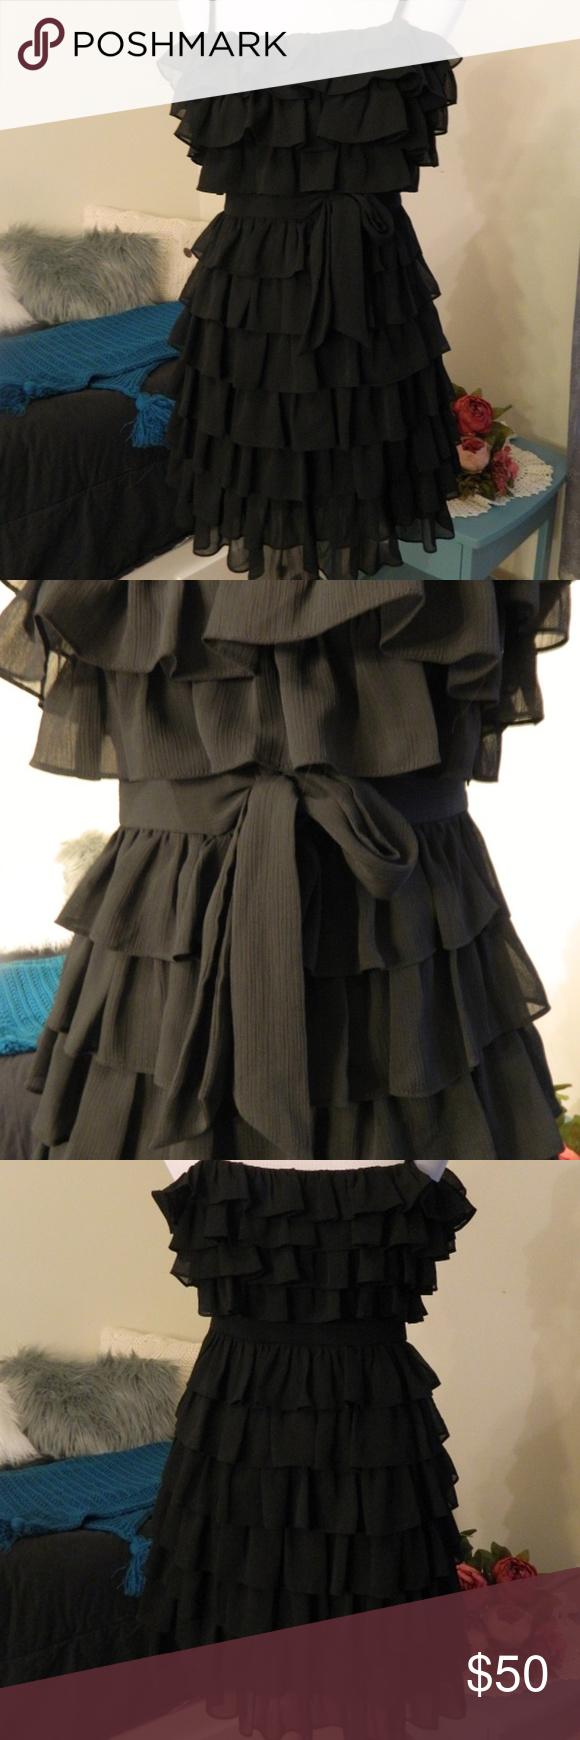 Nwot juicy couture black ruffle dress in my posh picks